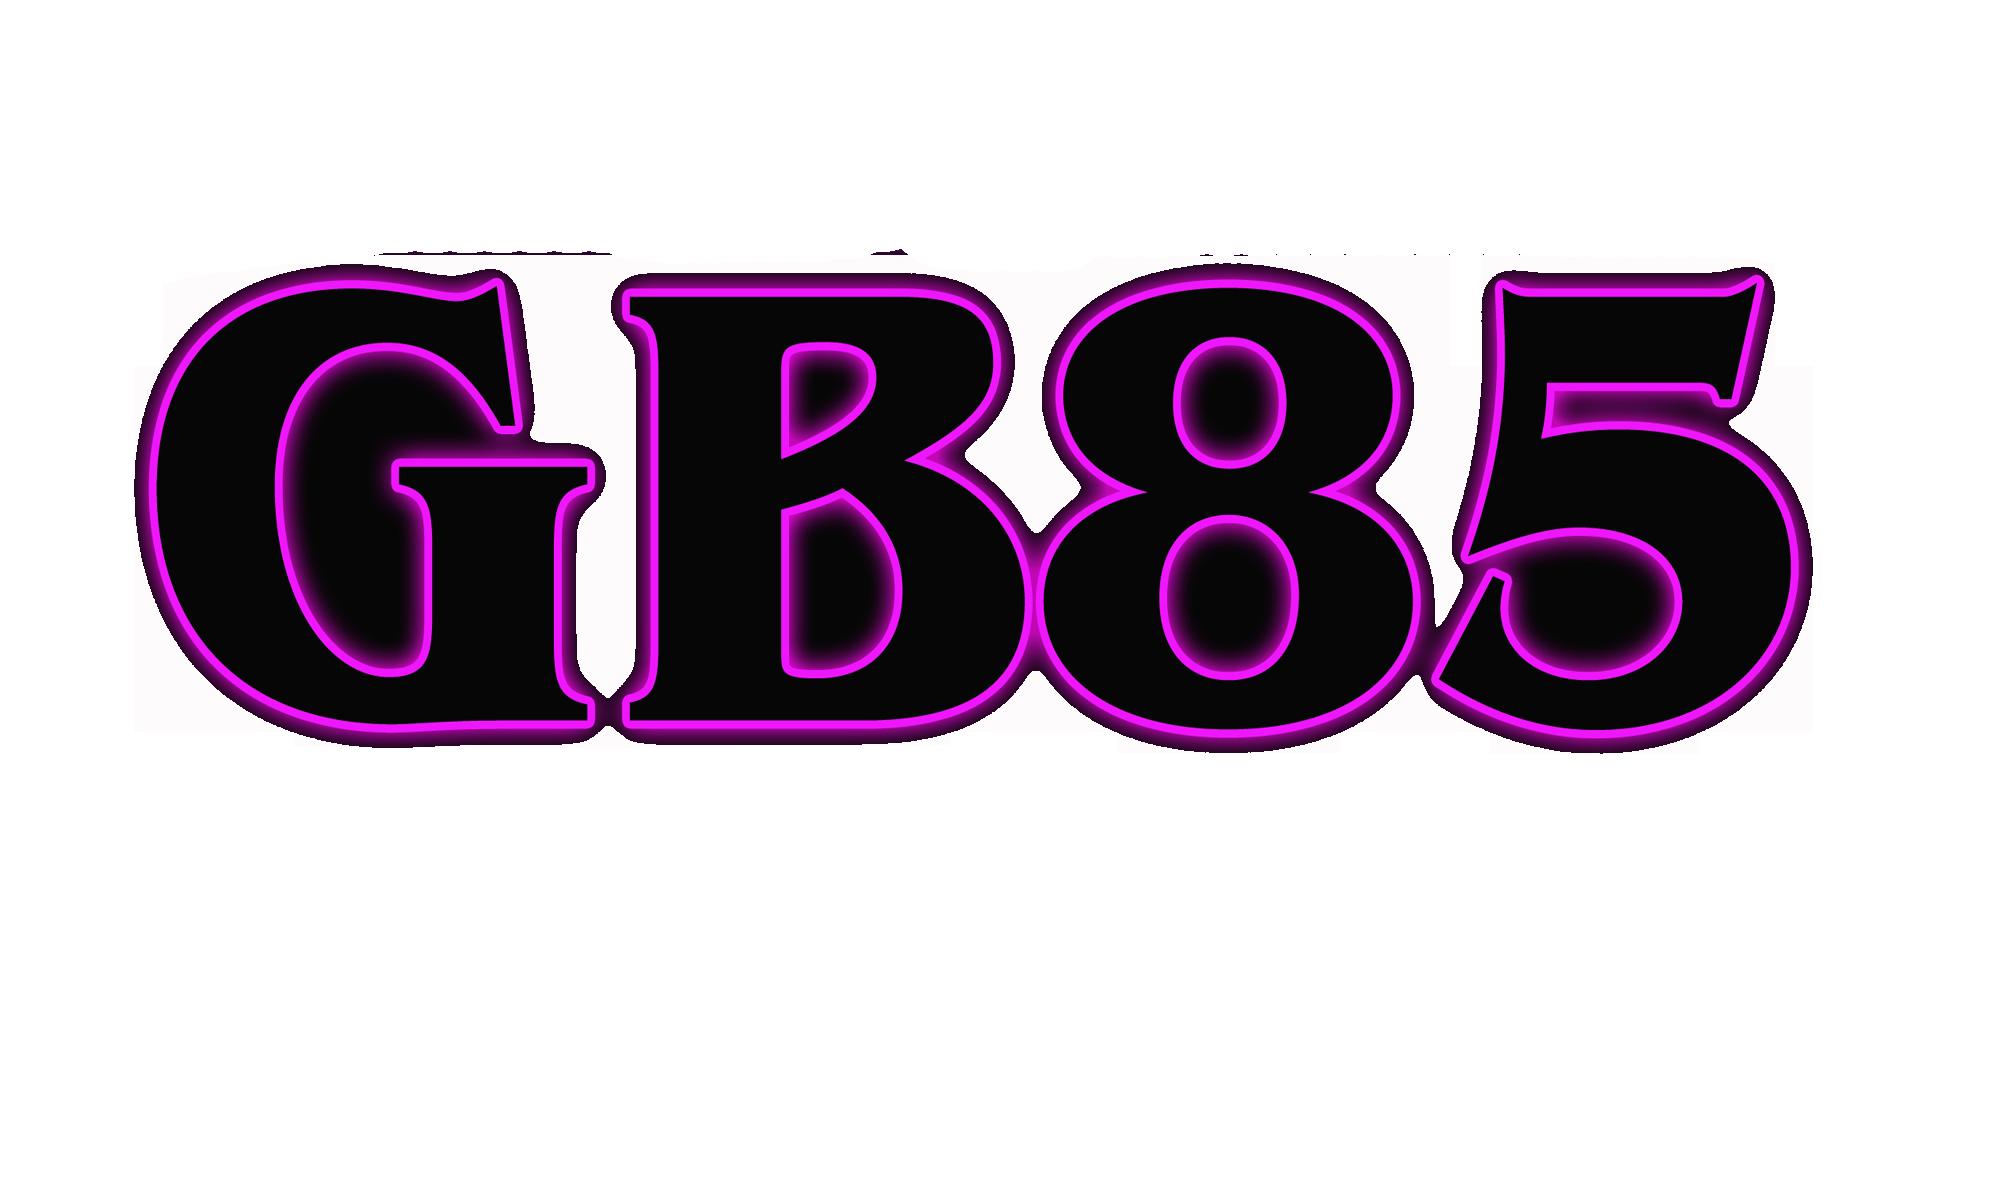 GB85 NYC